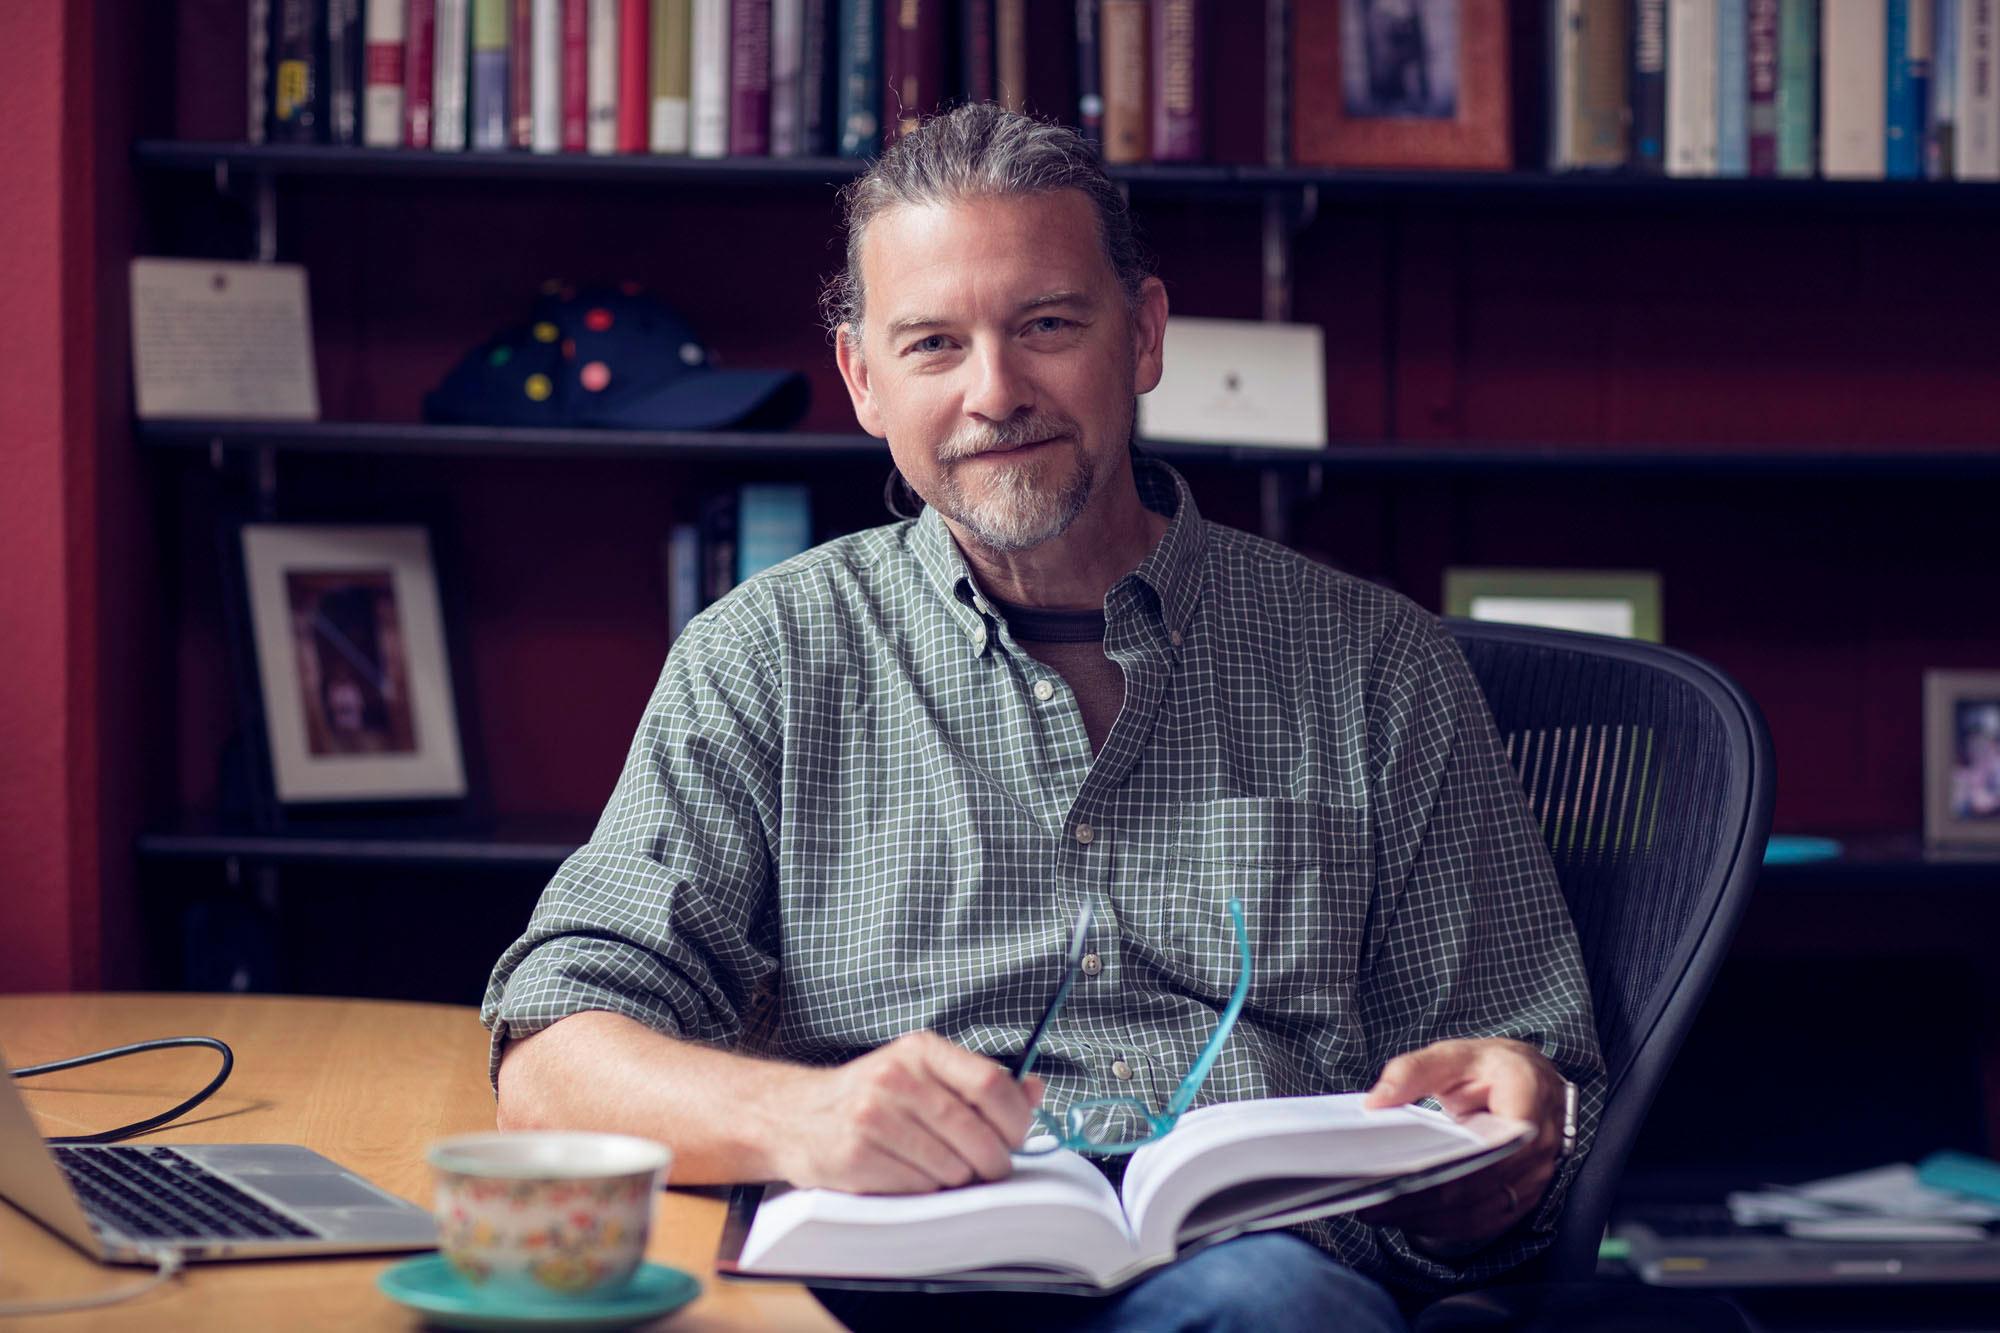 Psychology professor James Coan leads UVA's Virginia Affective Neuroscience Laboratory.